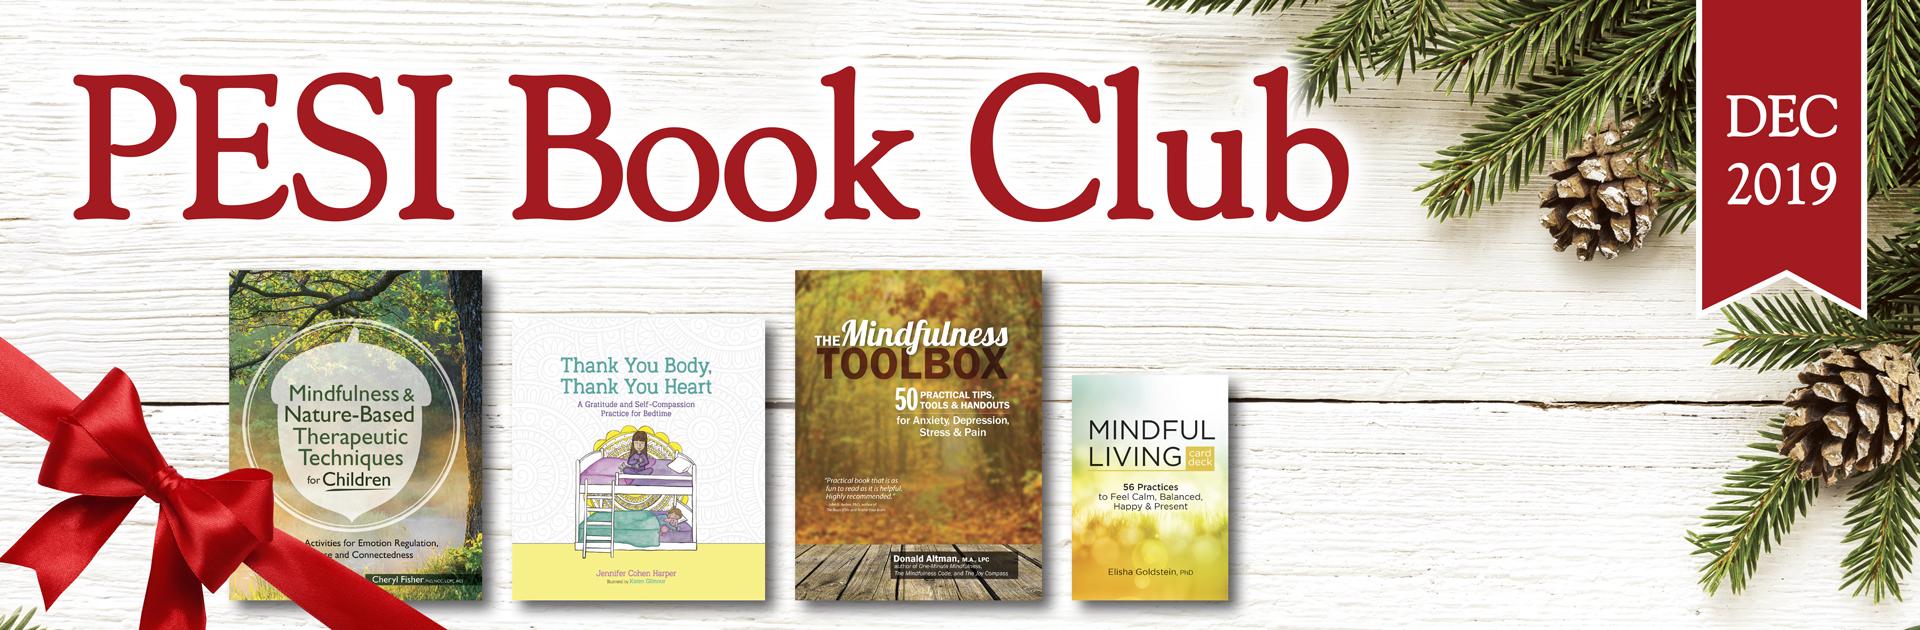 December 2019 Book Club